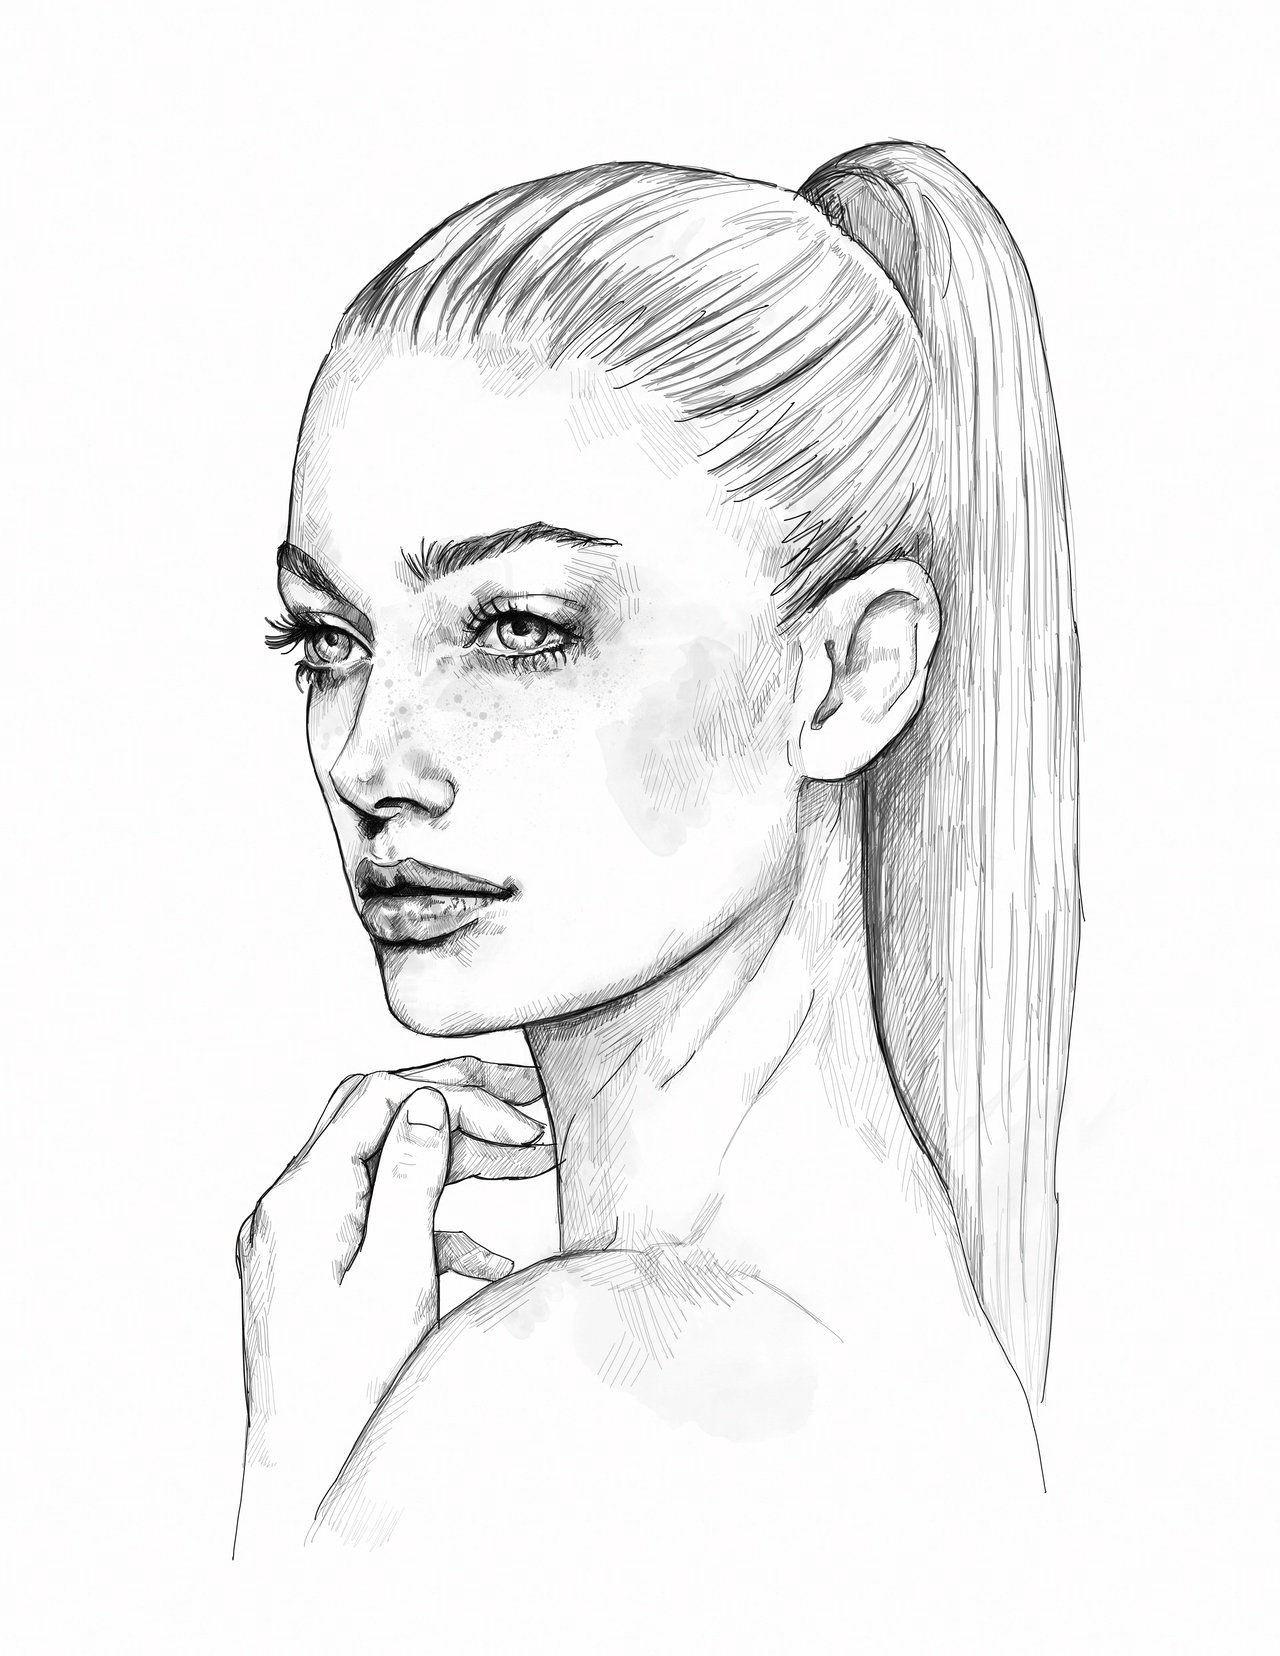 easy pencil drawings of faces a a aa arte de katie jagielnicka art portraiture